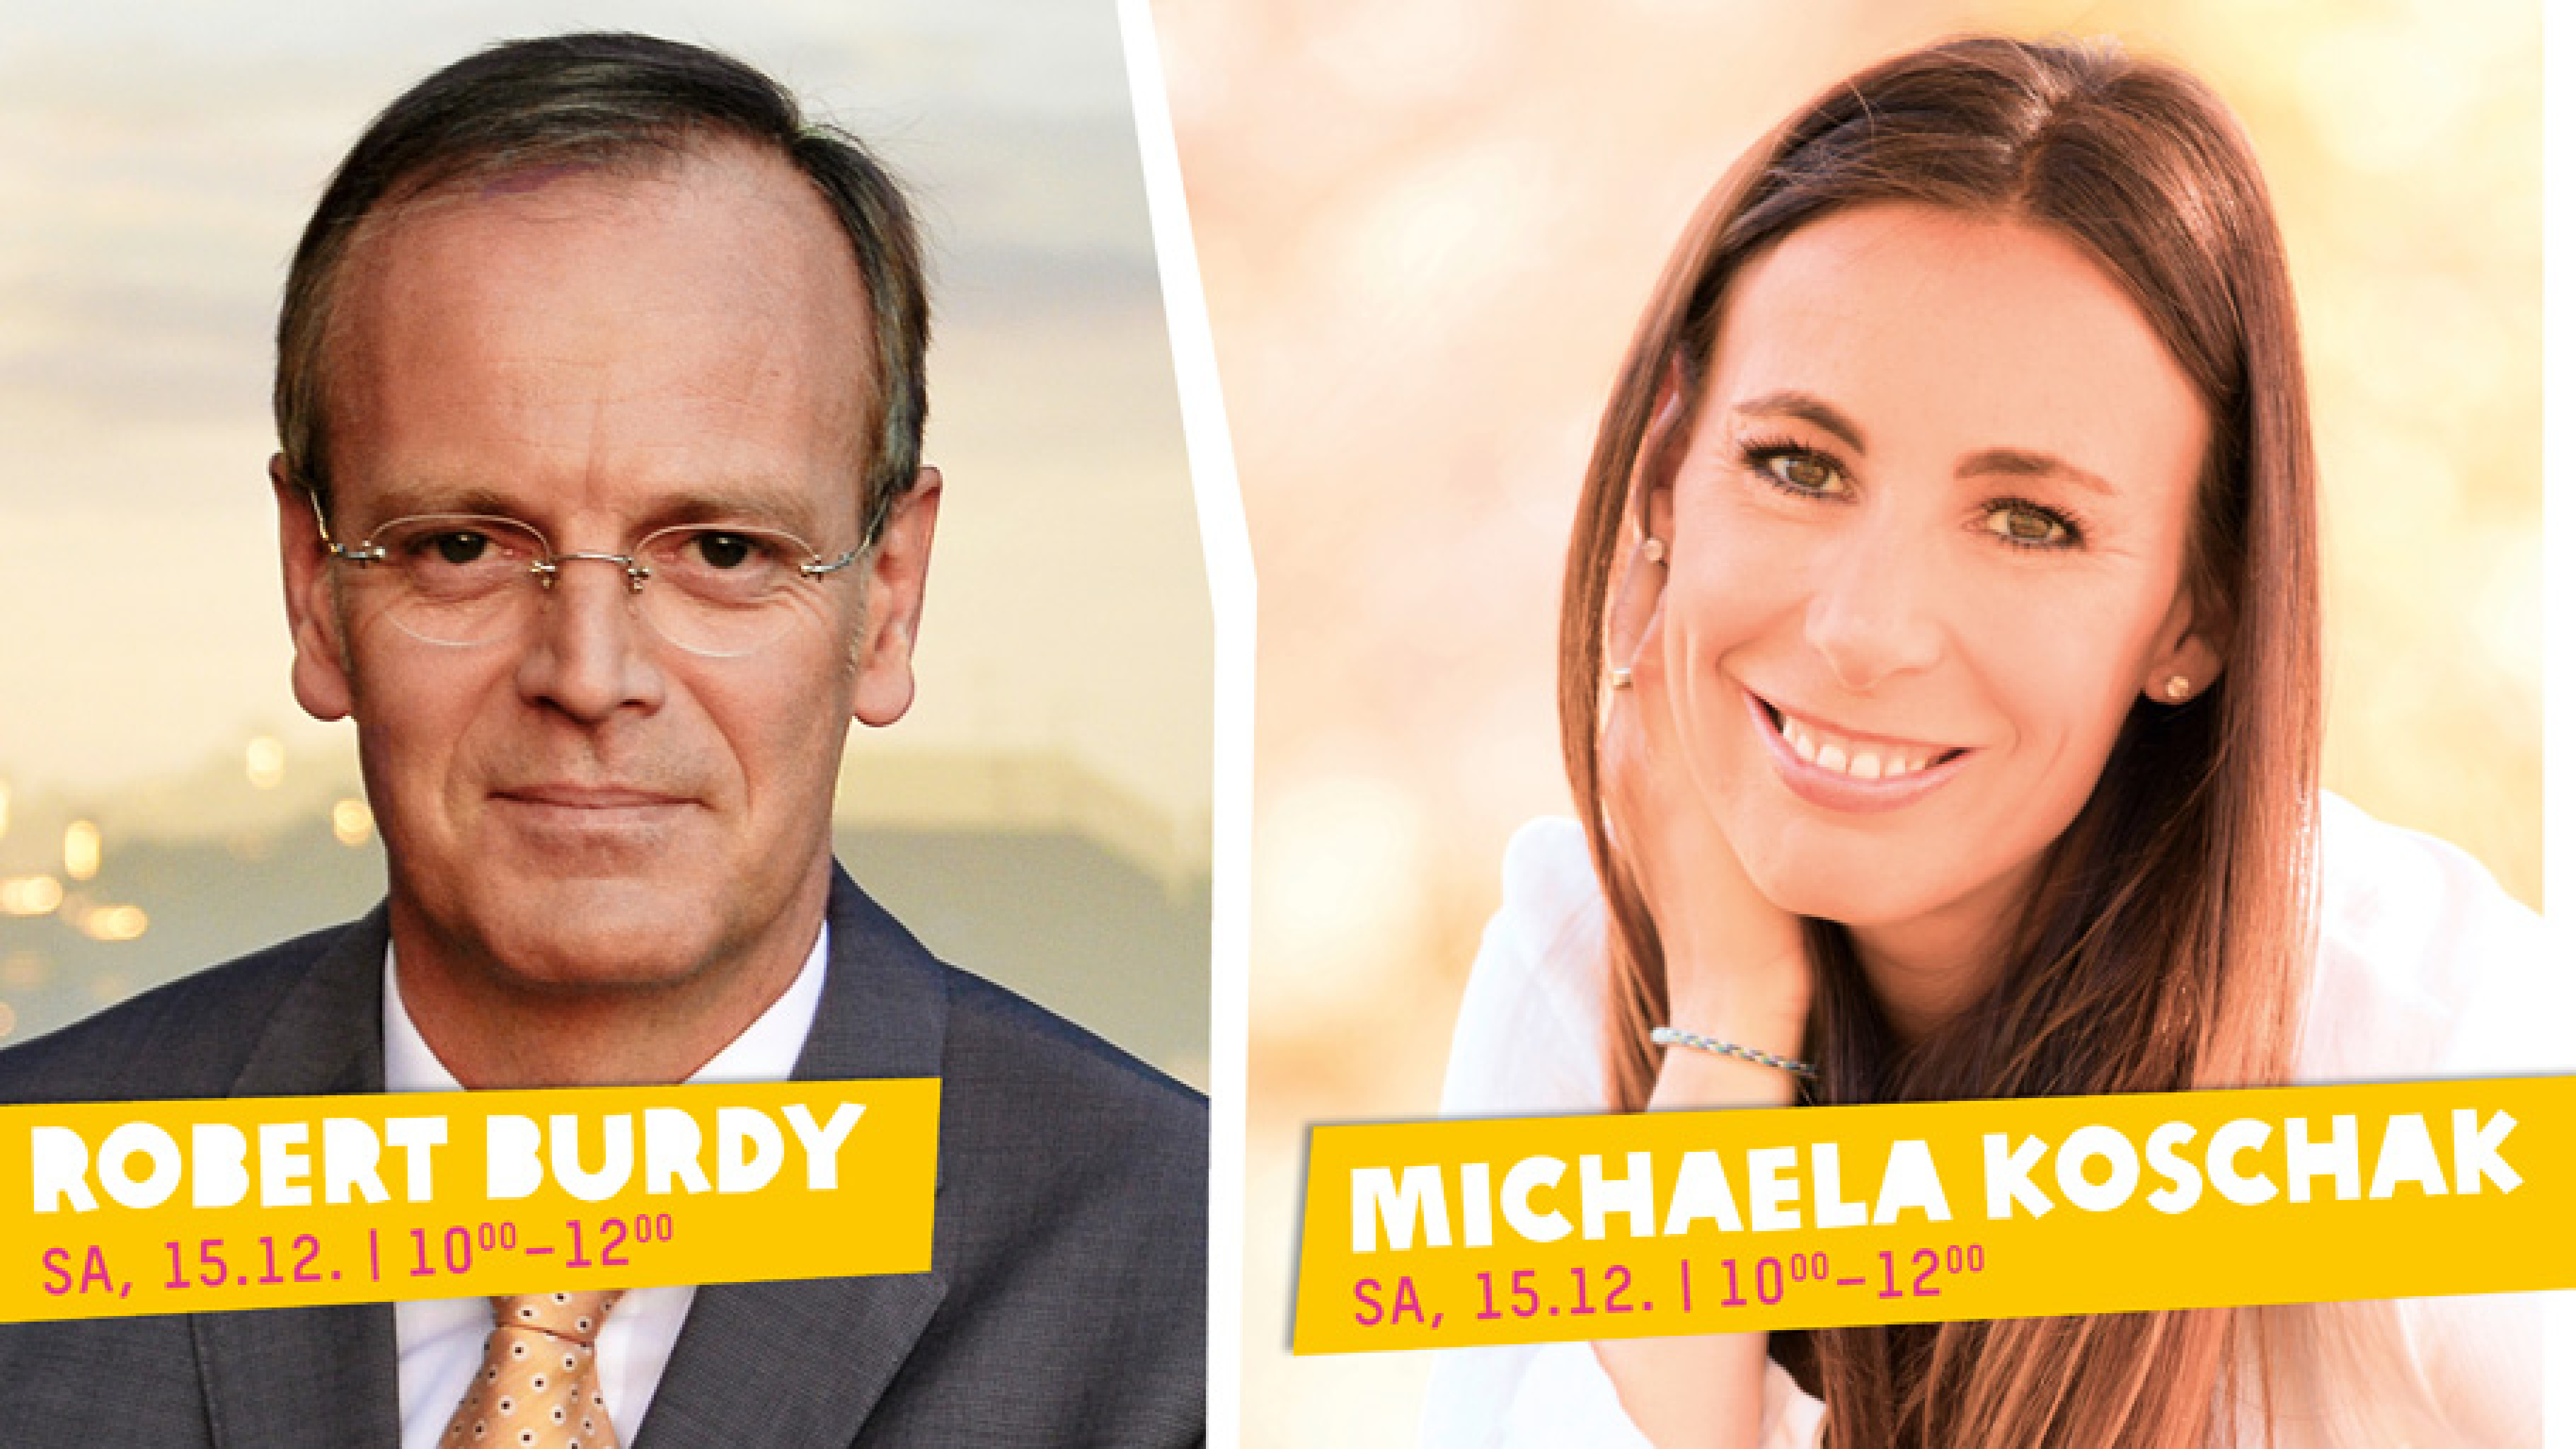 Die MDR-Moderator*innen Kamilla Senjo, Robert Burdy und Michaela Koschak (v.l.)